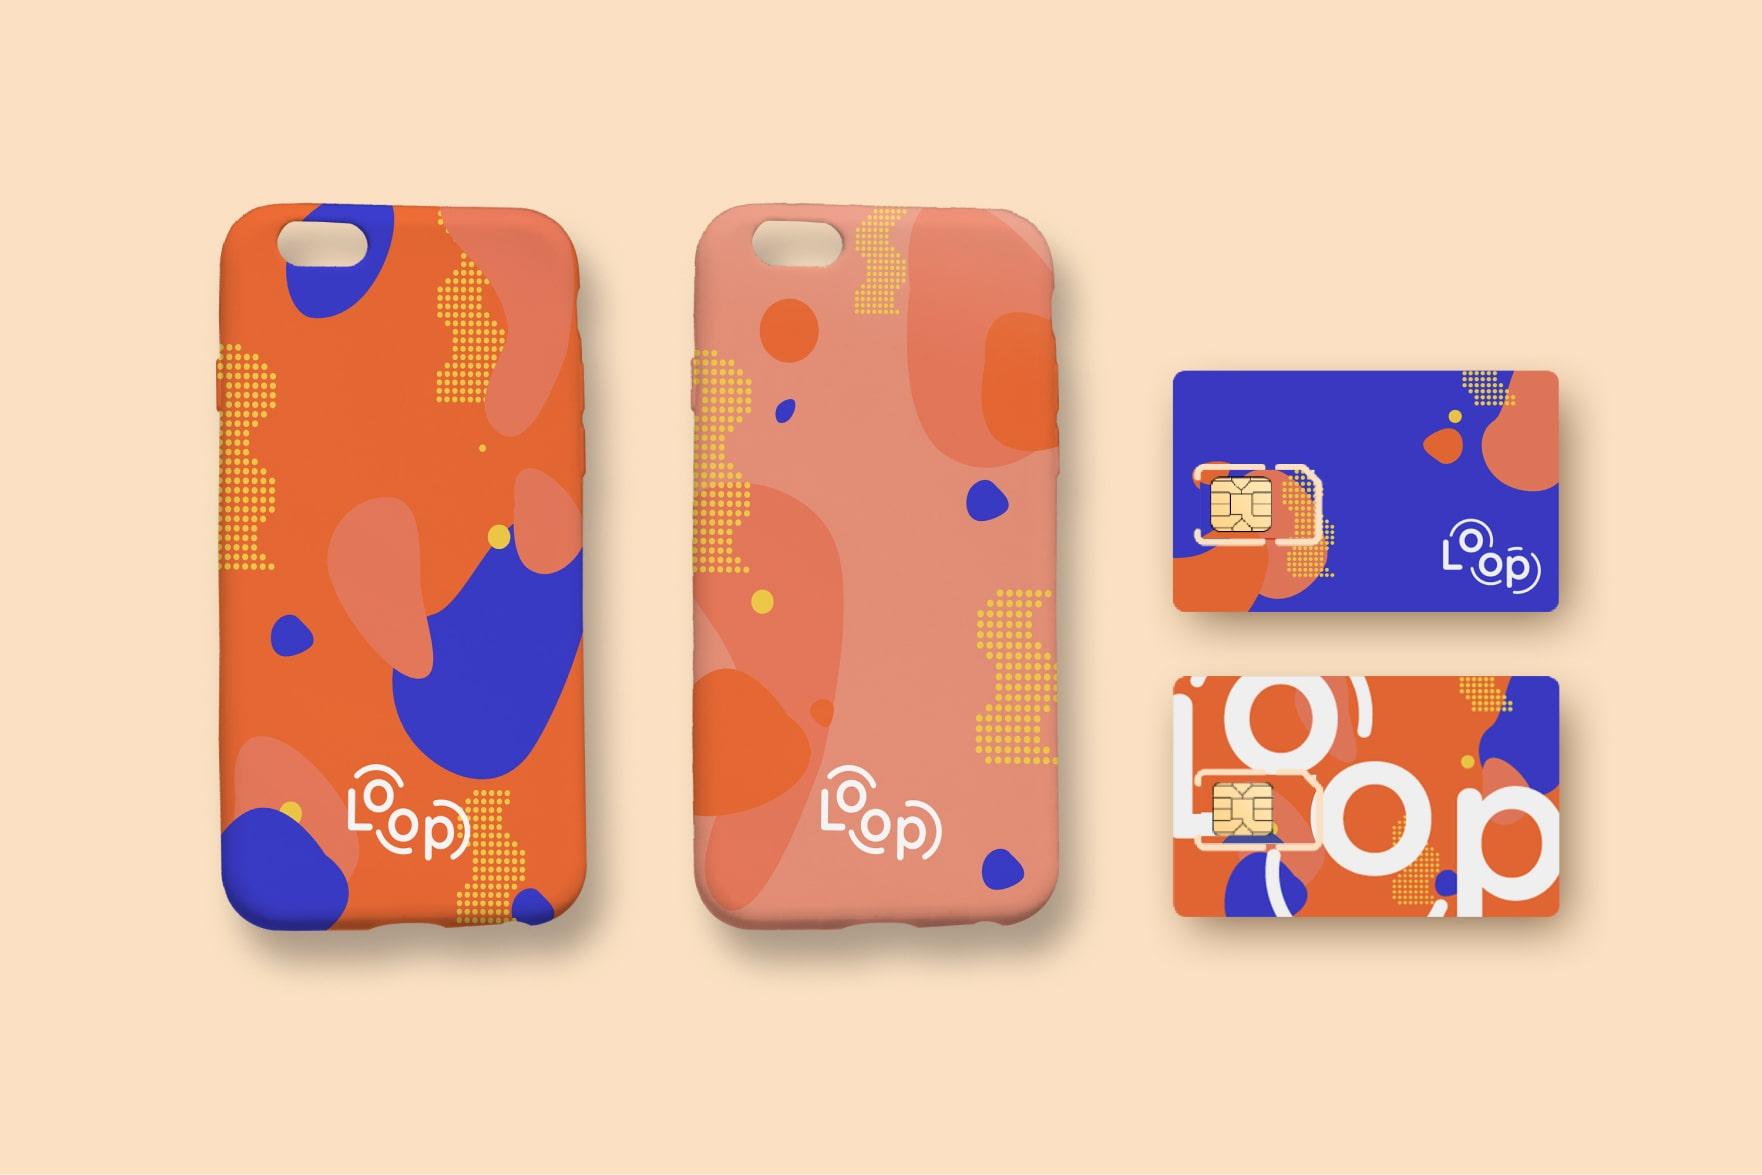 LOOP branding design